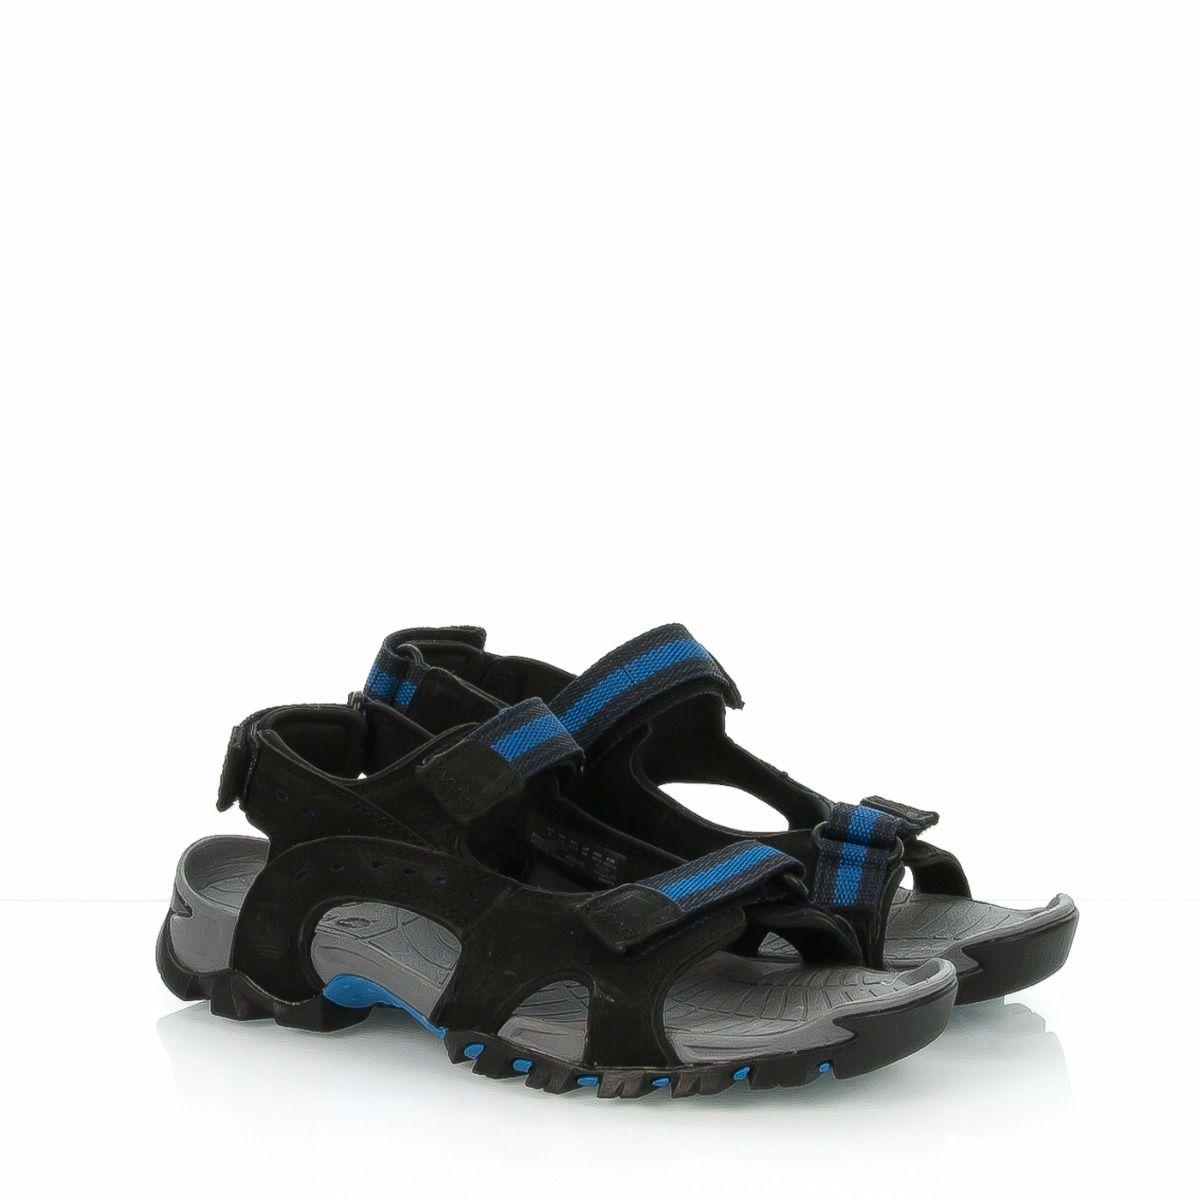 E Timberland Nero Tessuto Uomo Sandalo A161q Camoscio Ybg67yvf